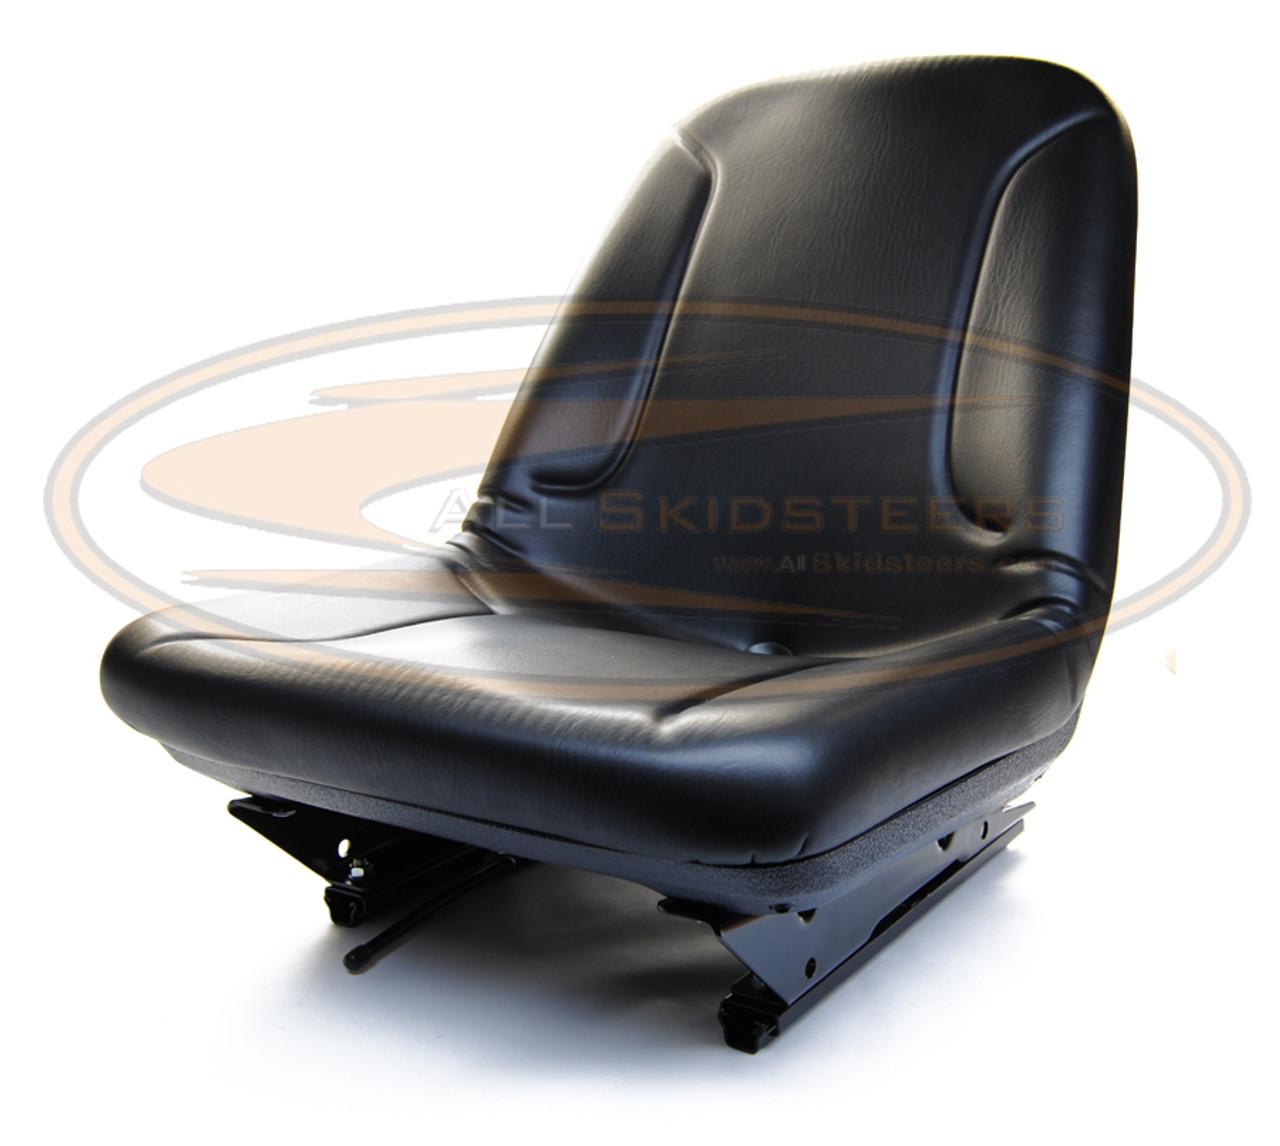 Seat for New Holland® Skid Steer LX985, LX885, LS190, L150, LX465, L185,  L565, LS180, L170, LX565, LT190 B, L190, LS190 B, L160, C185, LS185 B,  LS170,